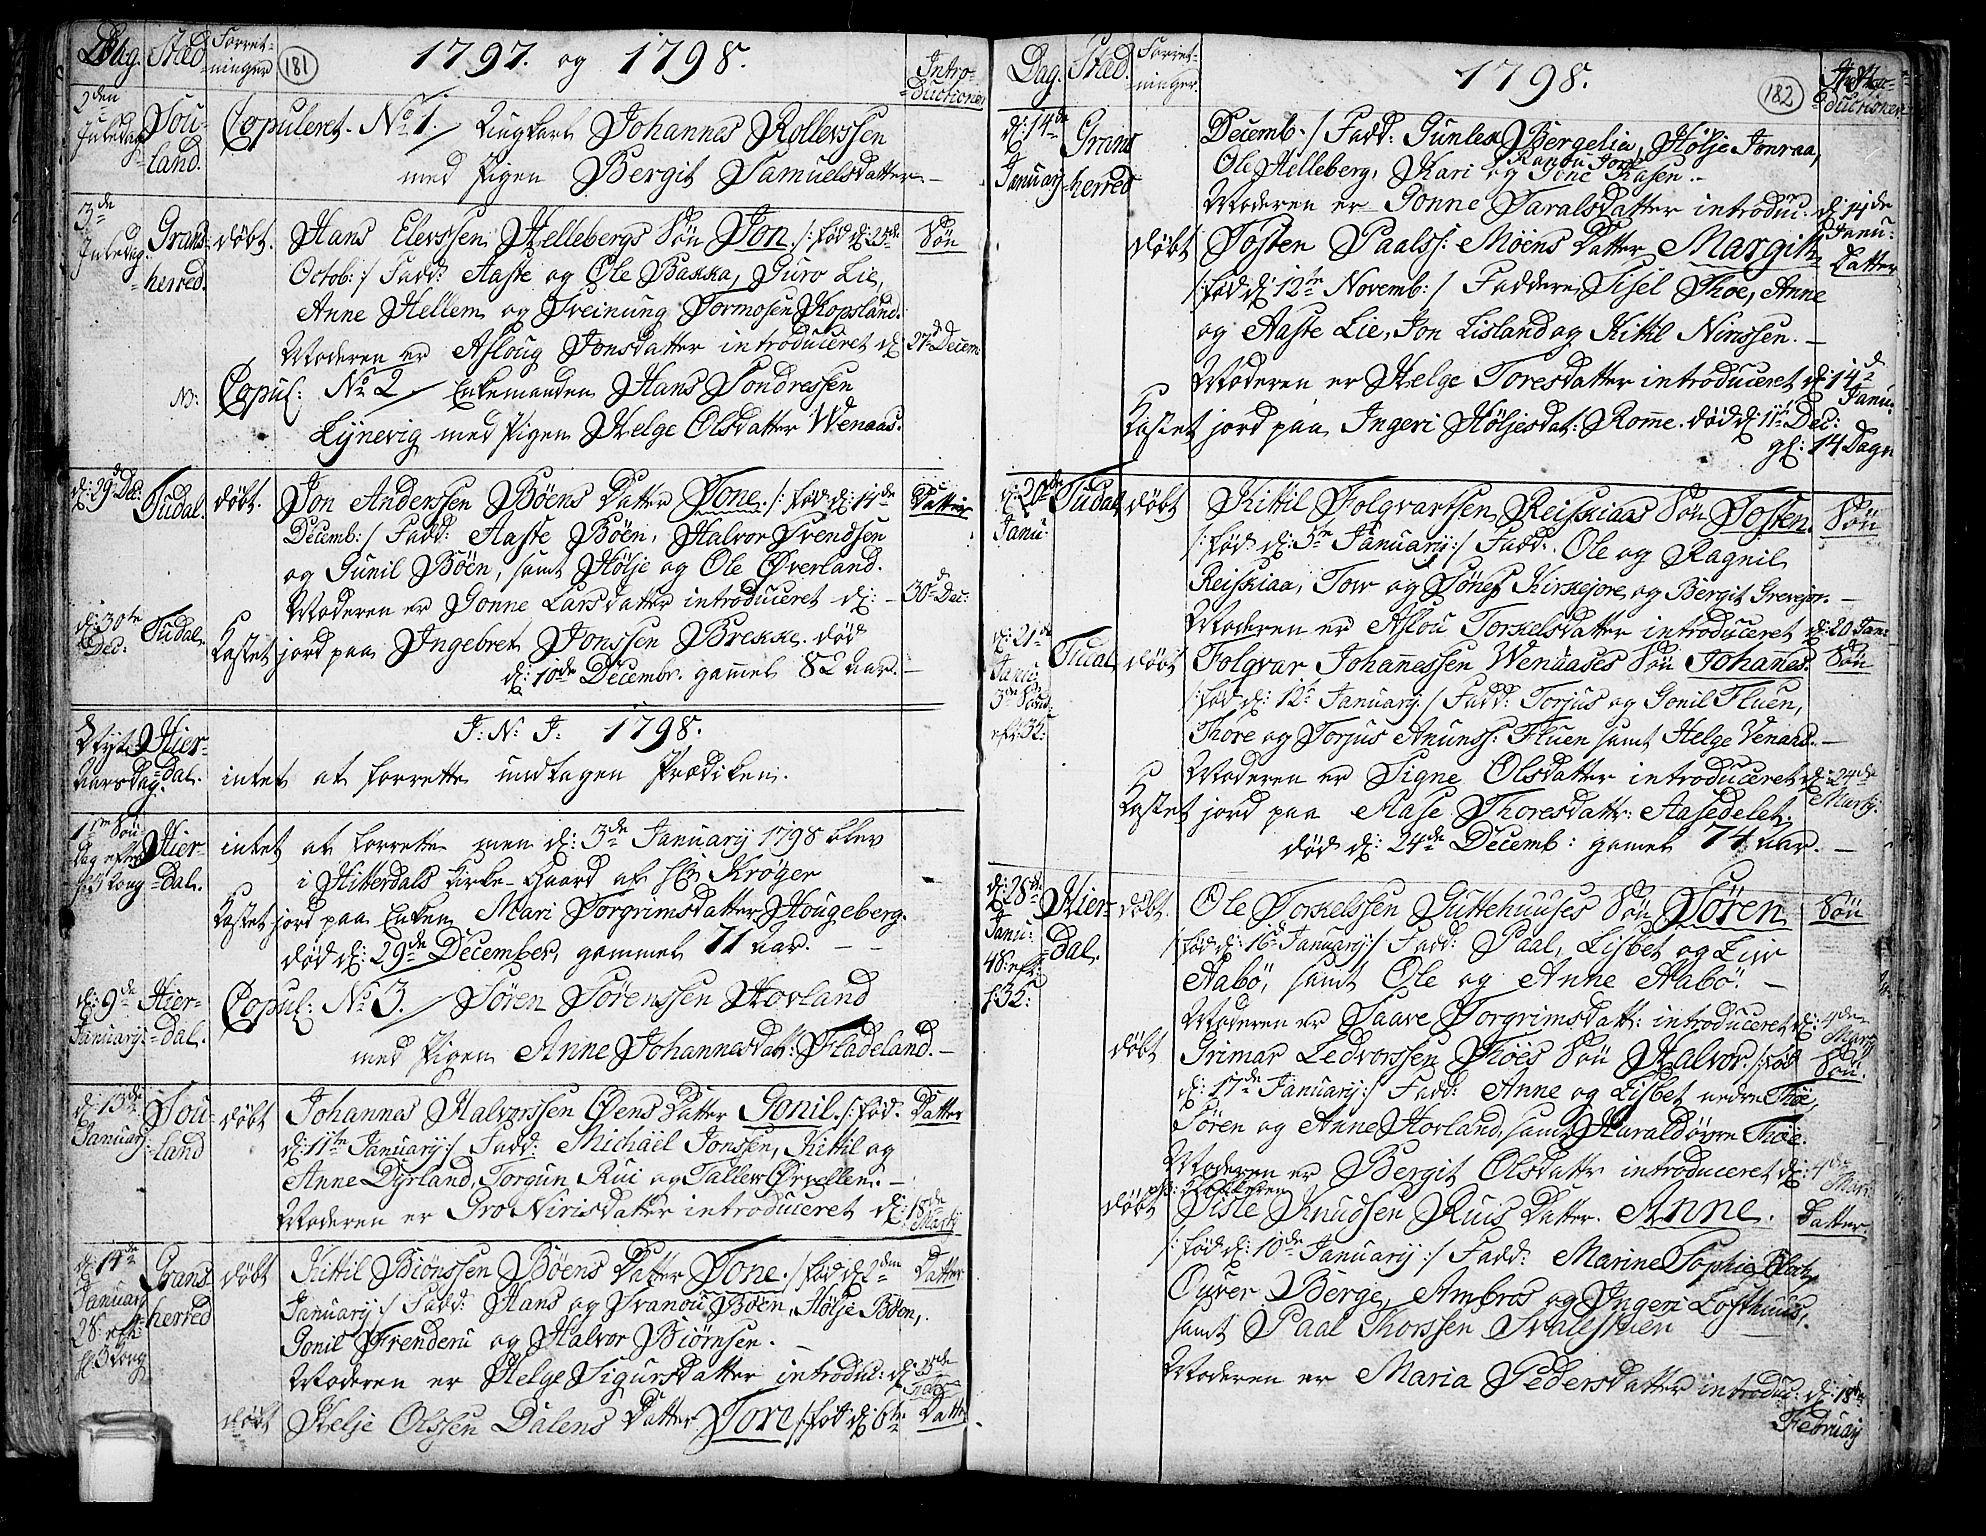 SAKO, Hjartdal kirkebøker, F/Fa/L0005: Ministerialbok nr. I 5, 1776-1801, s. 181-182